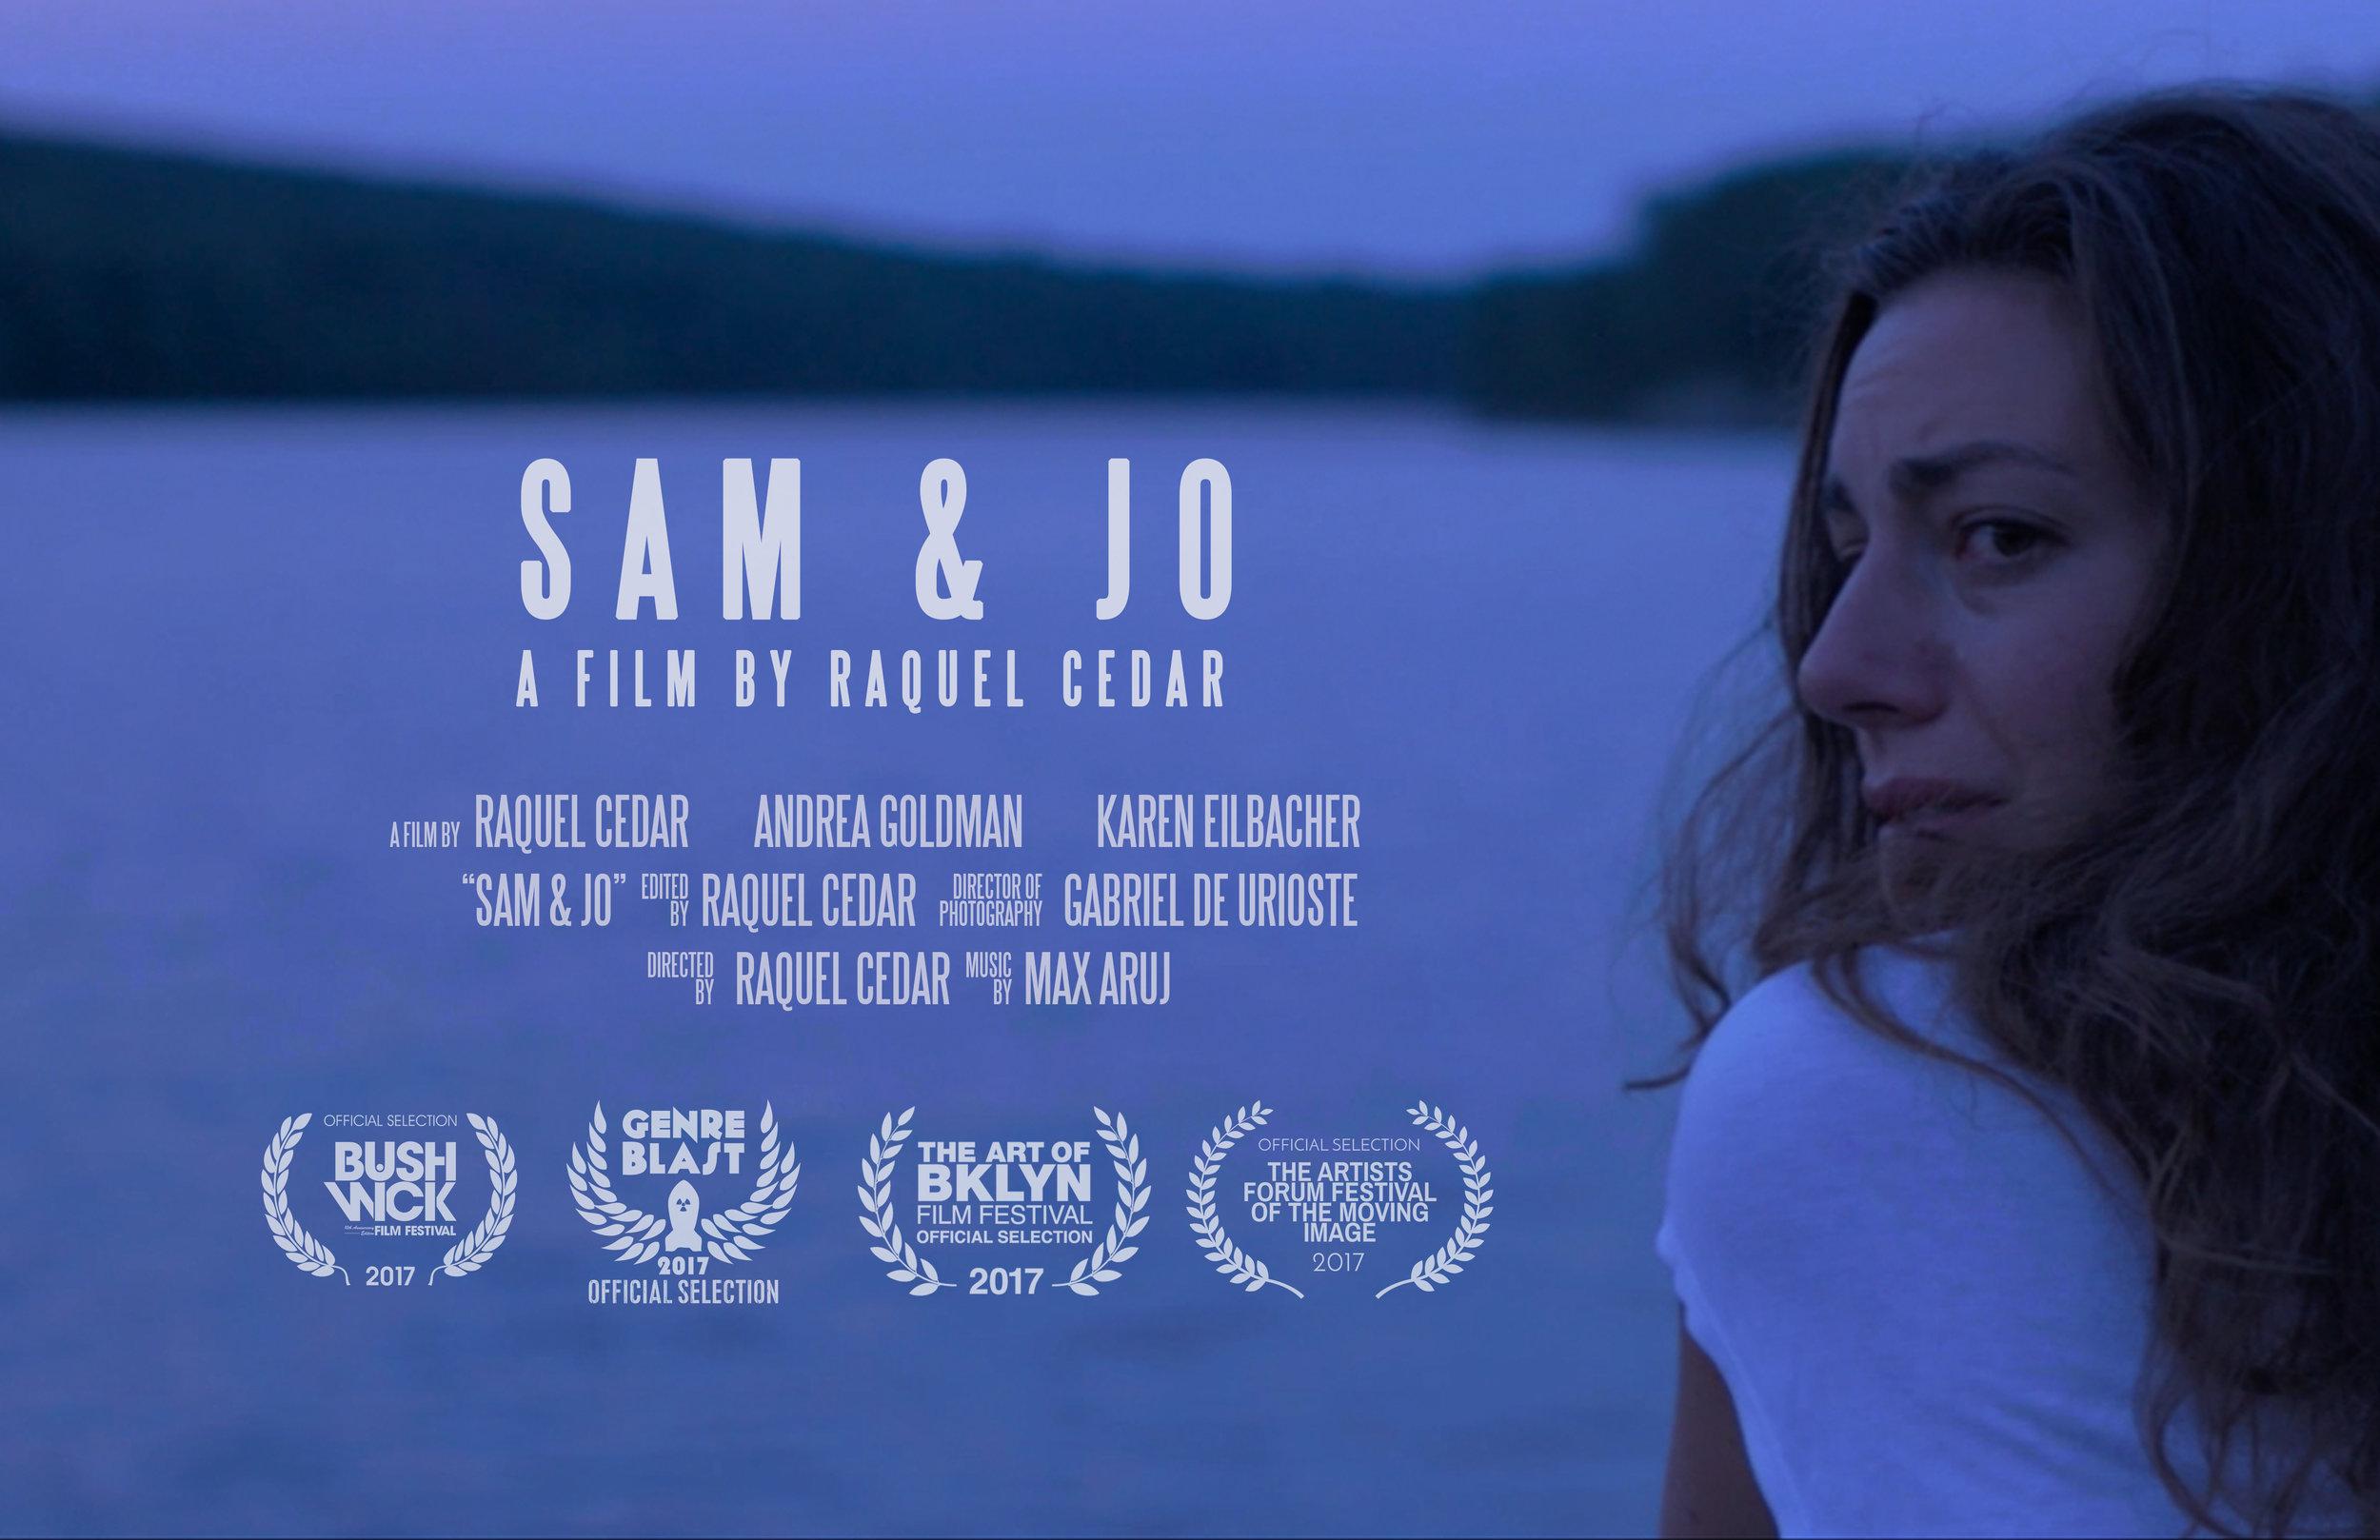 Sam & Jo